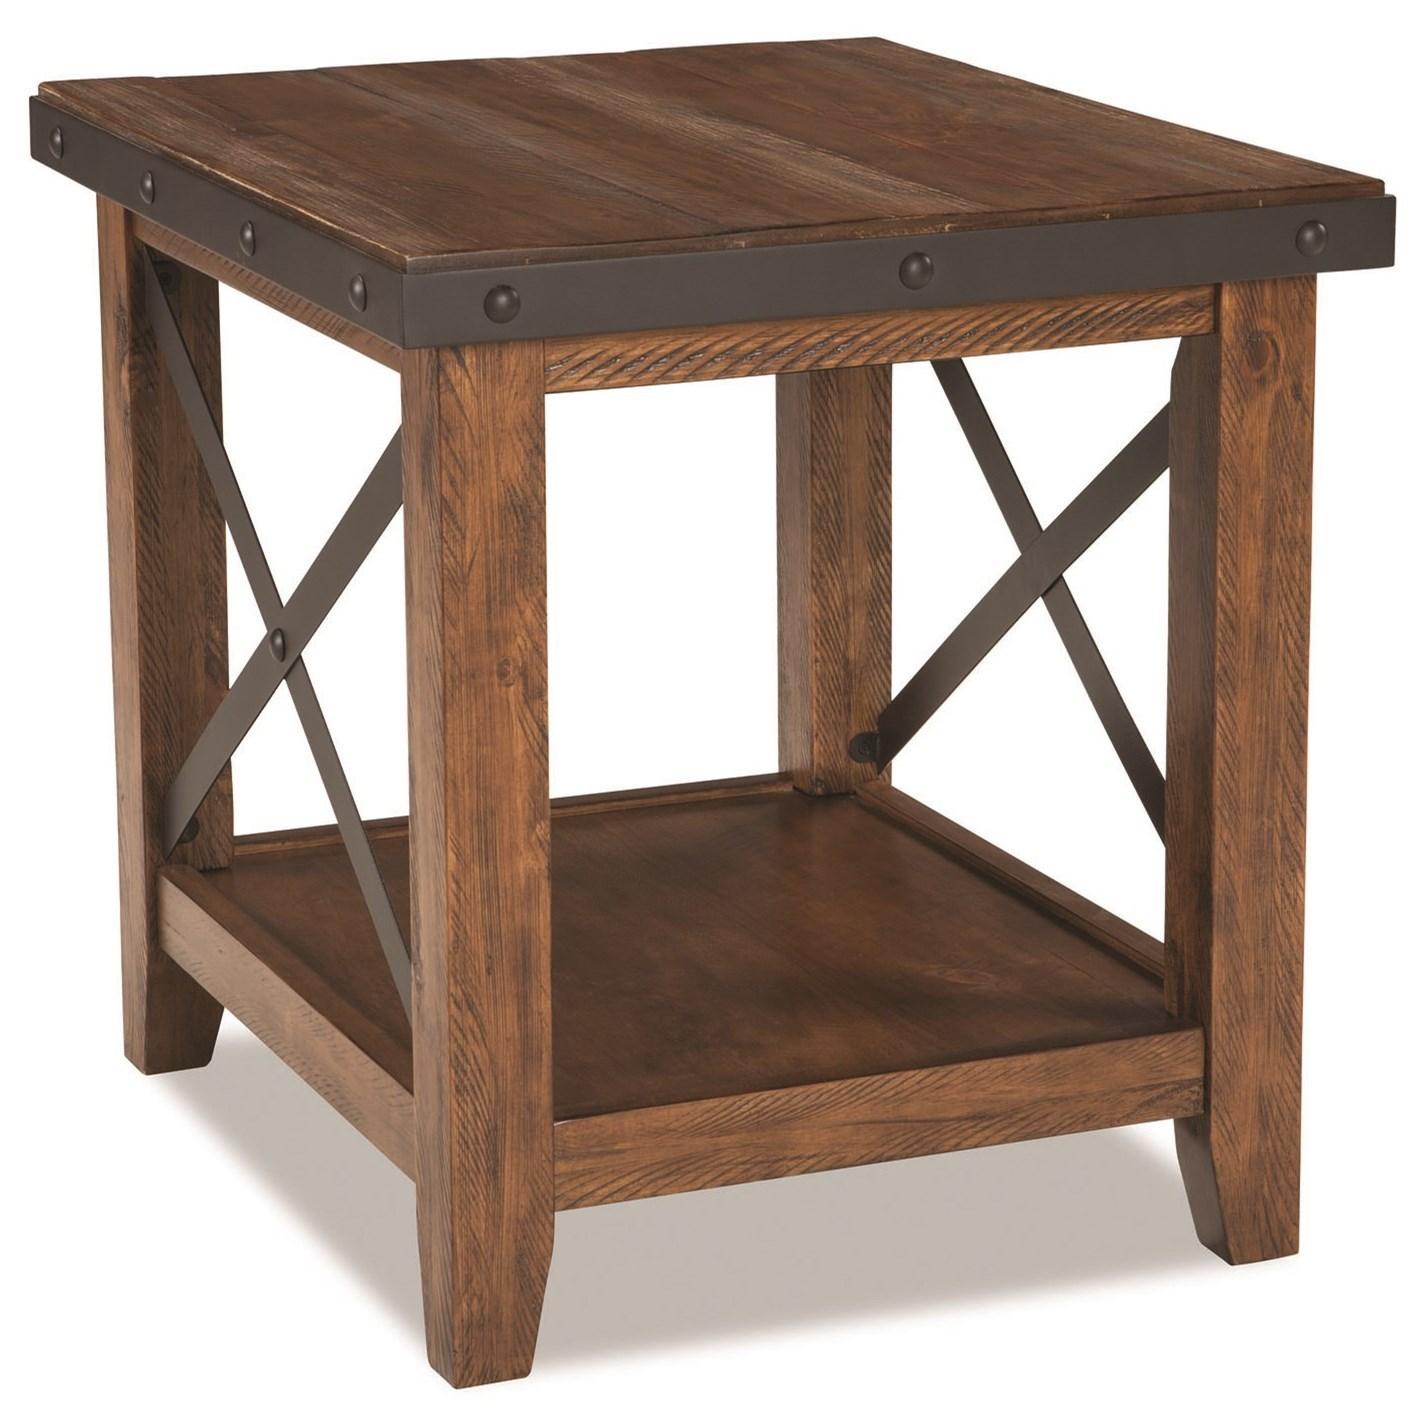 Incroyable Intercon TaosEnd Table ...